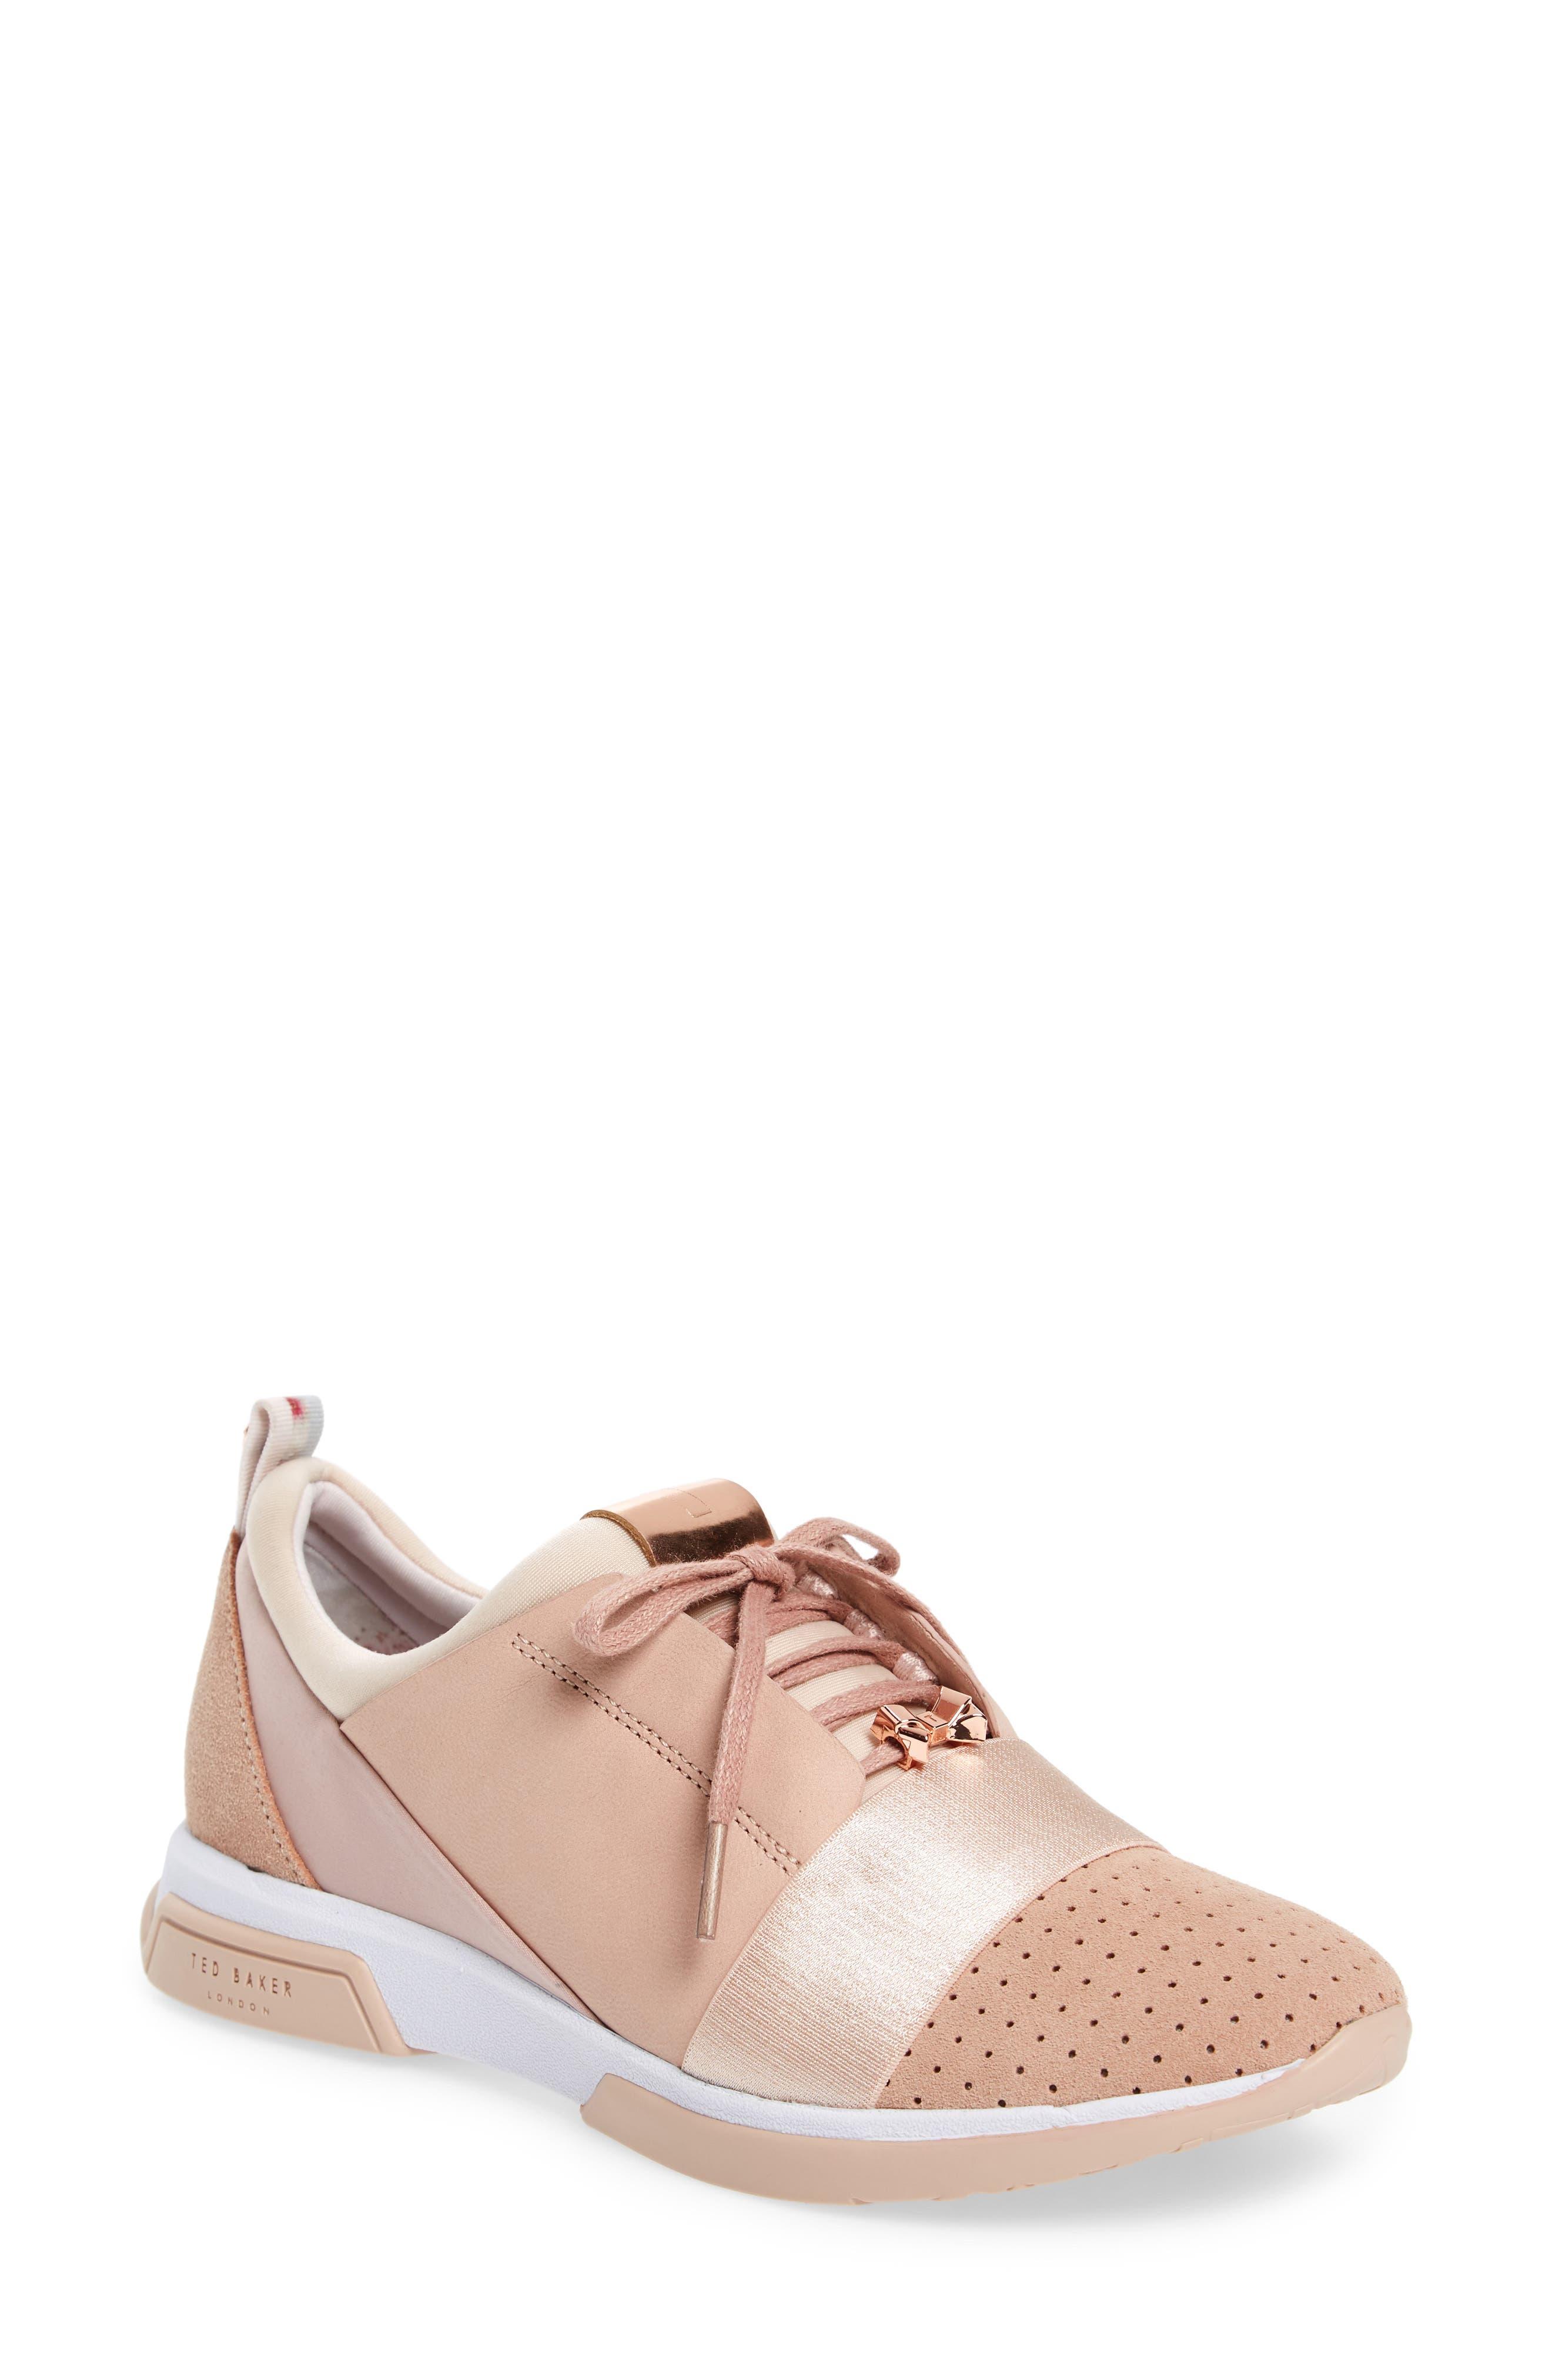 Cepa Sneaker,                             Main thumbnail 1, color,                             LIGHT PINK